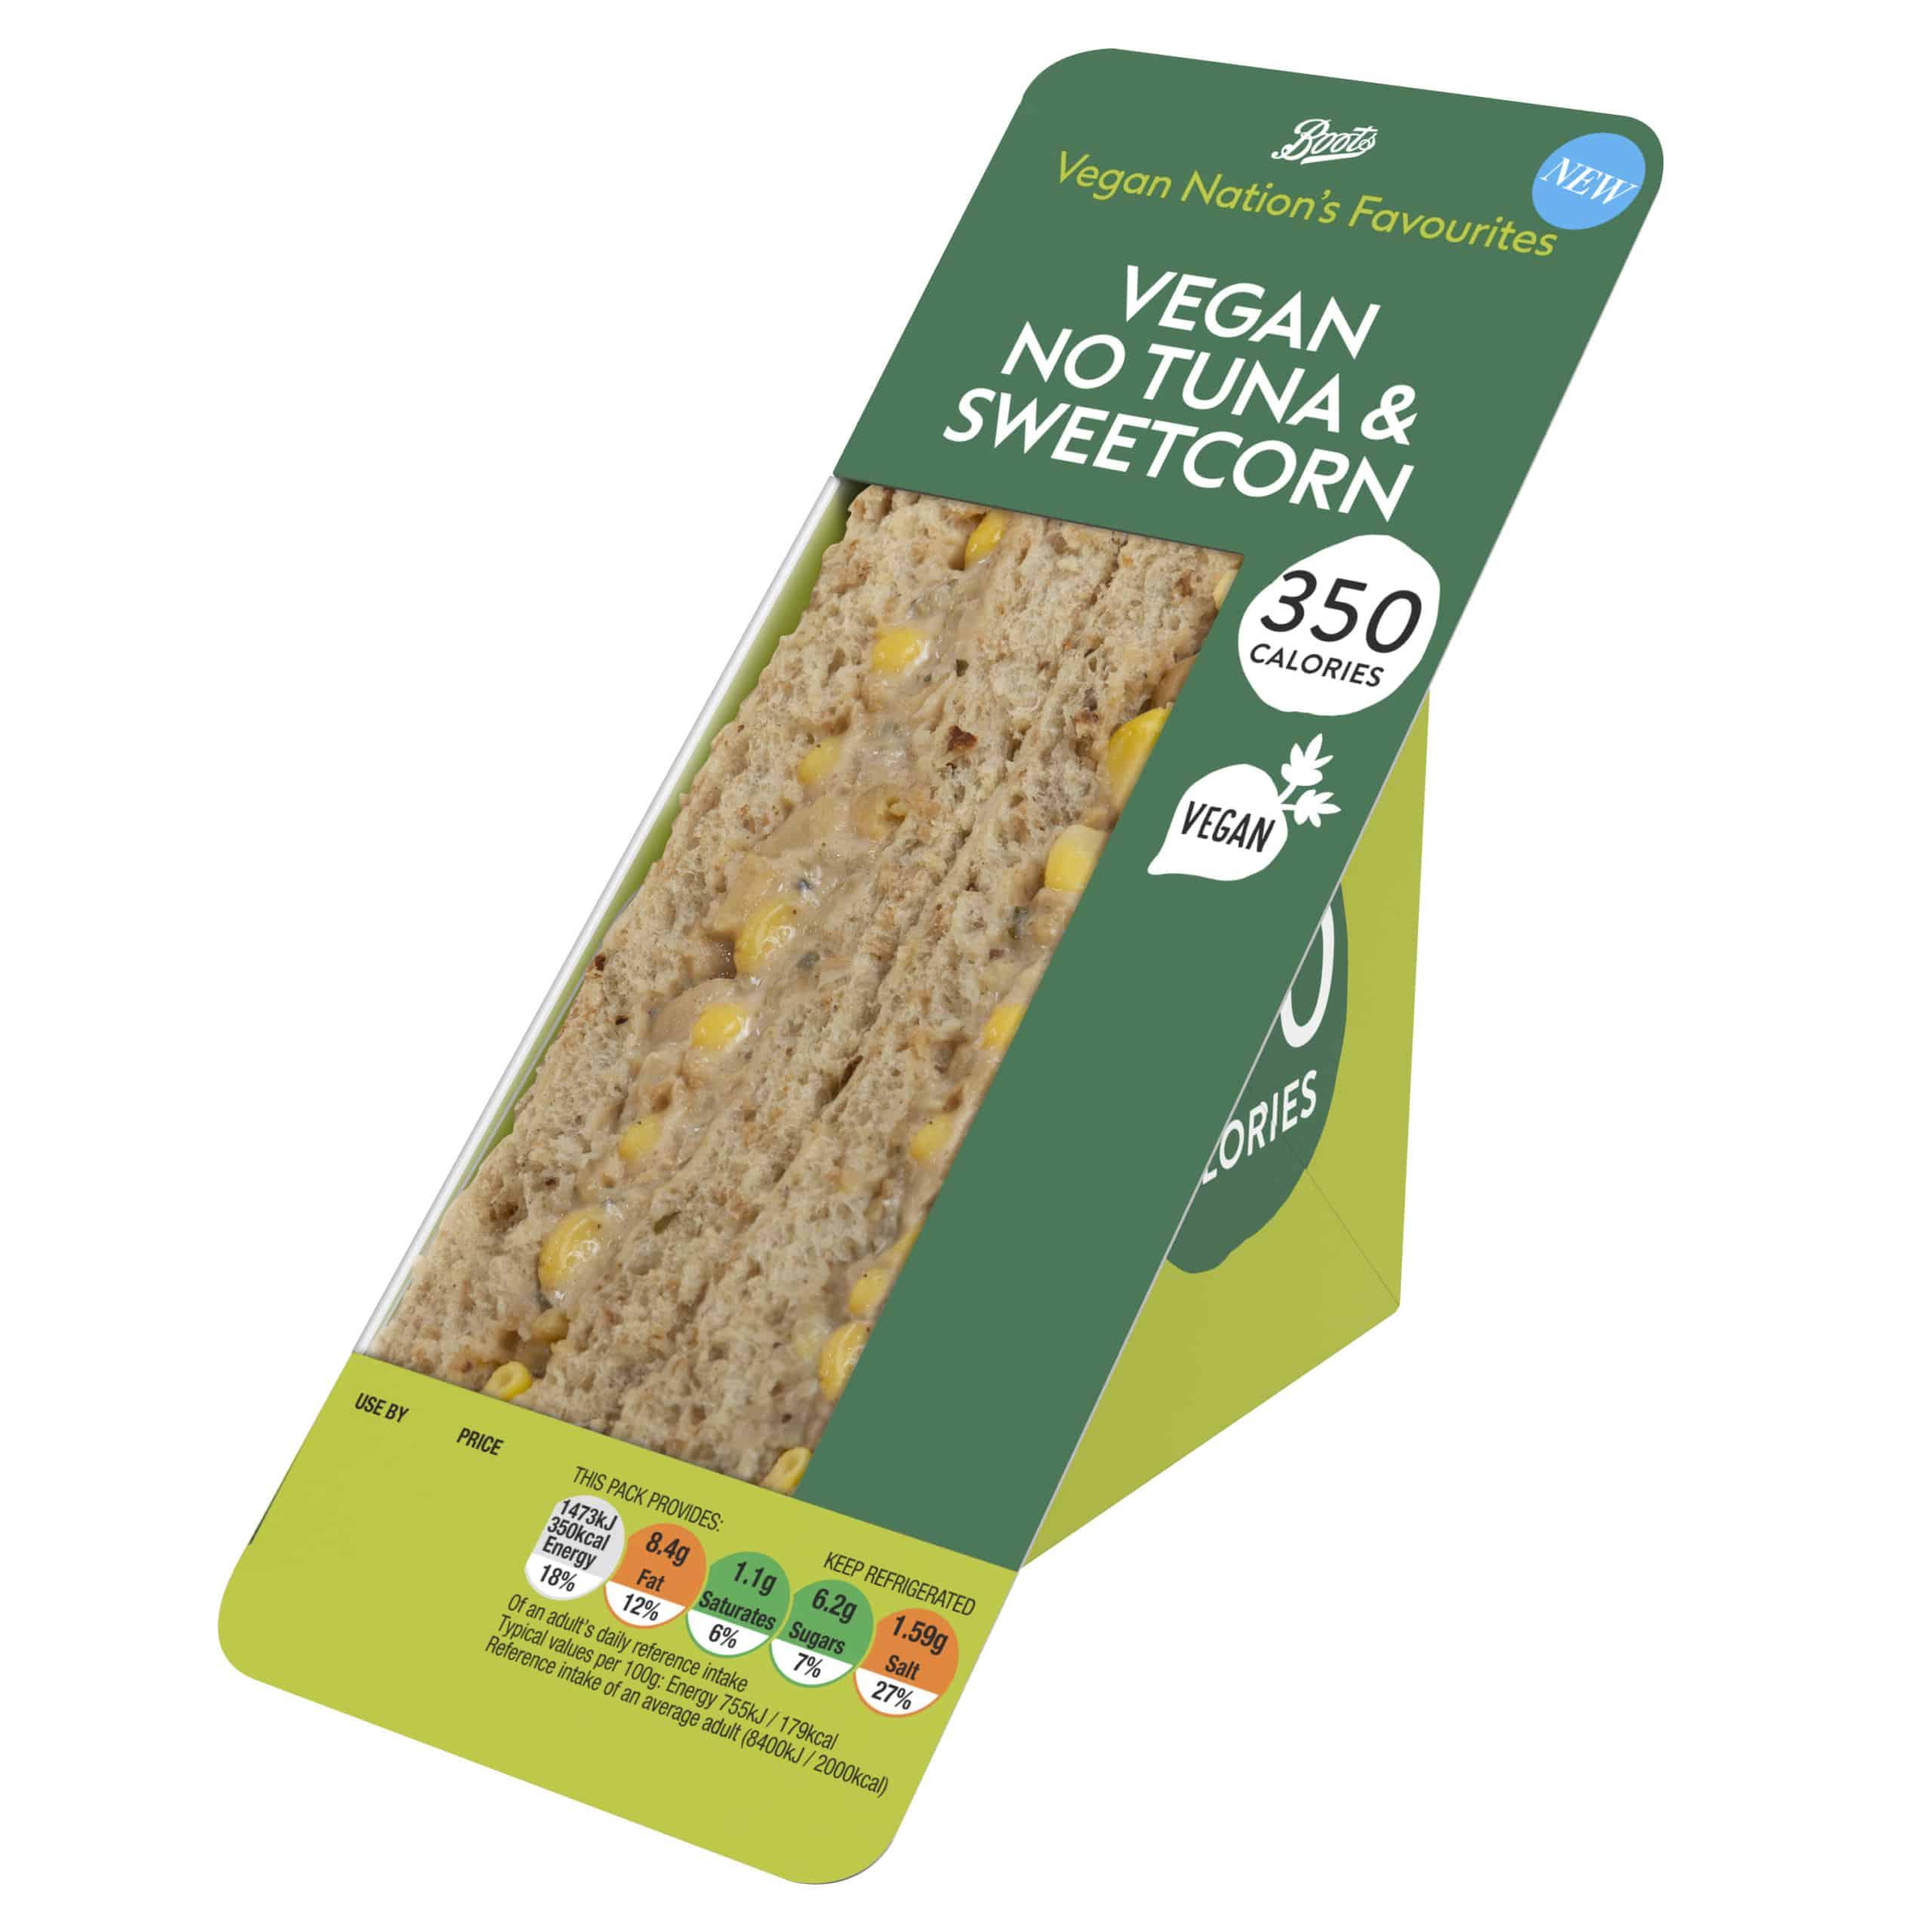 Boots vegan sandwiches